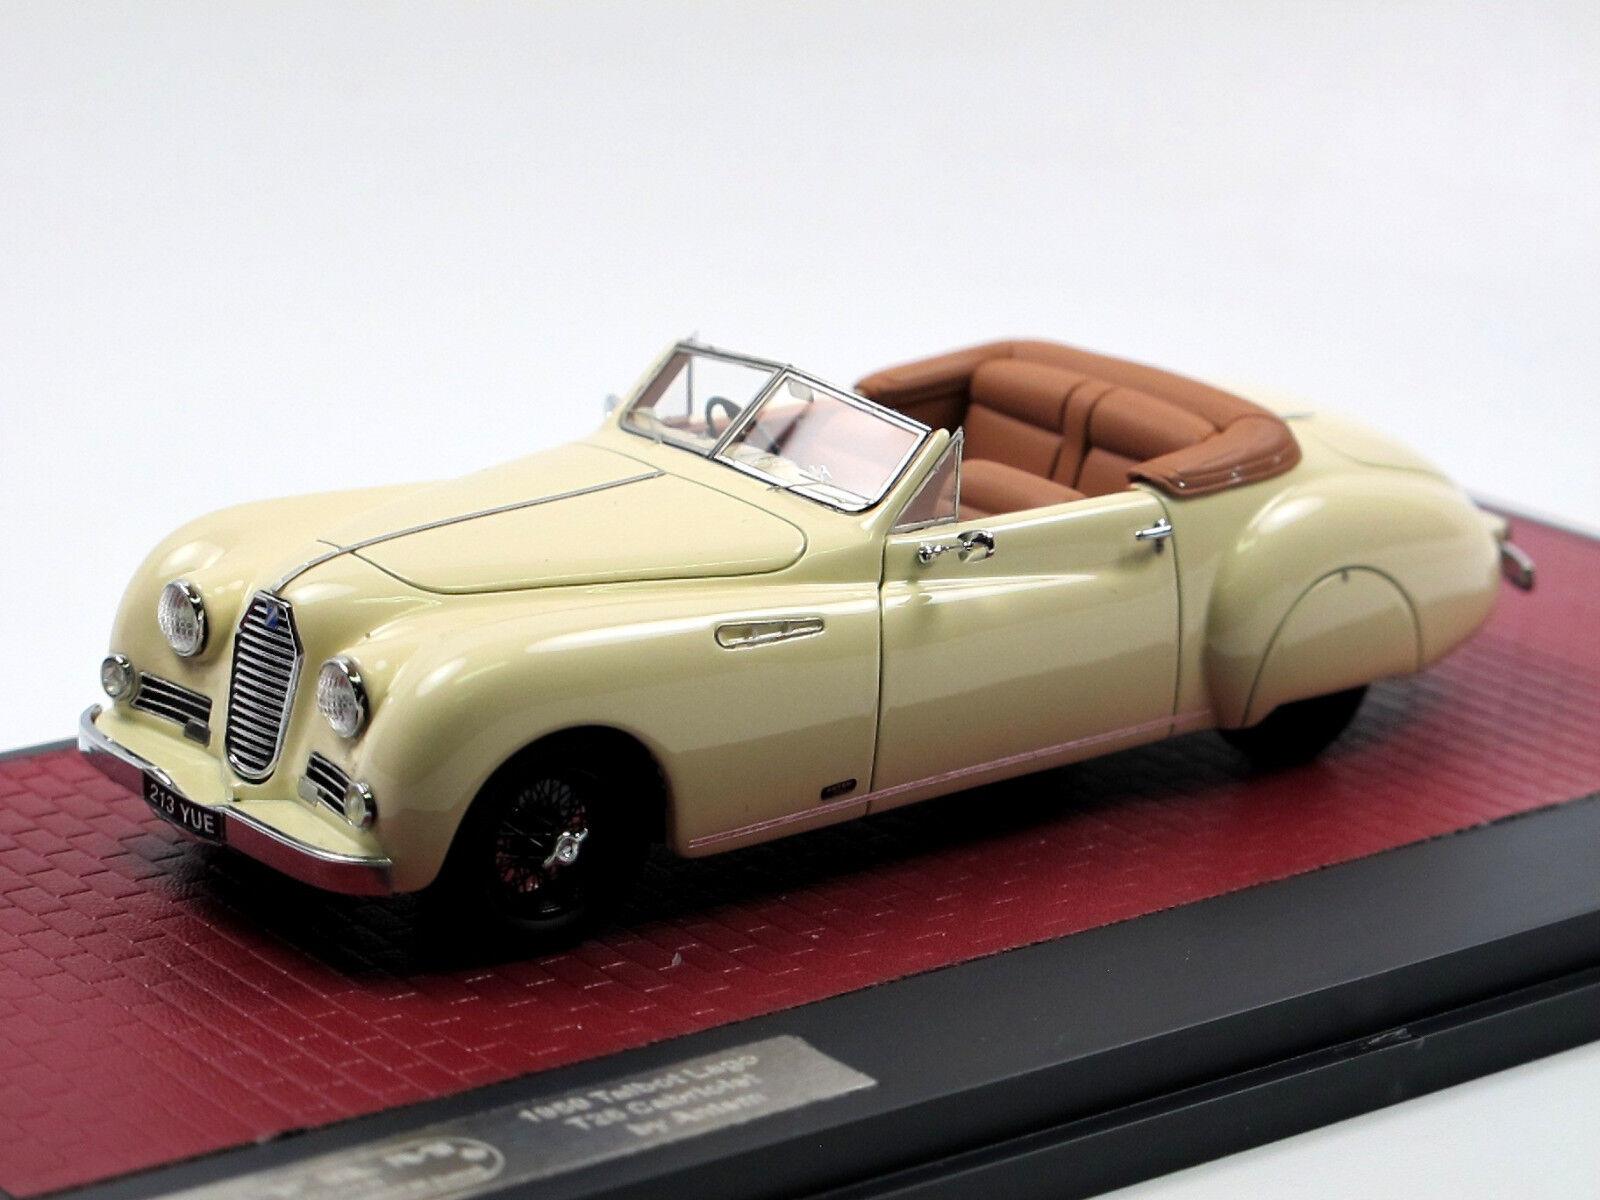 MATRIX SCALE MODELS 1950 TALBOT LAGO t26 Cabriolet by ANTEM Cream 1 43